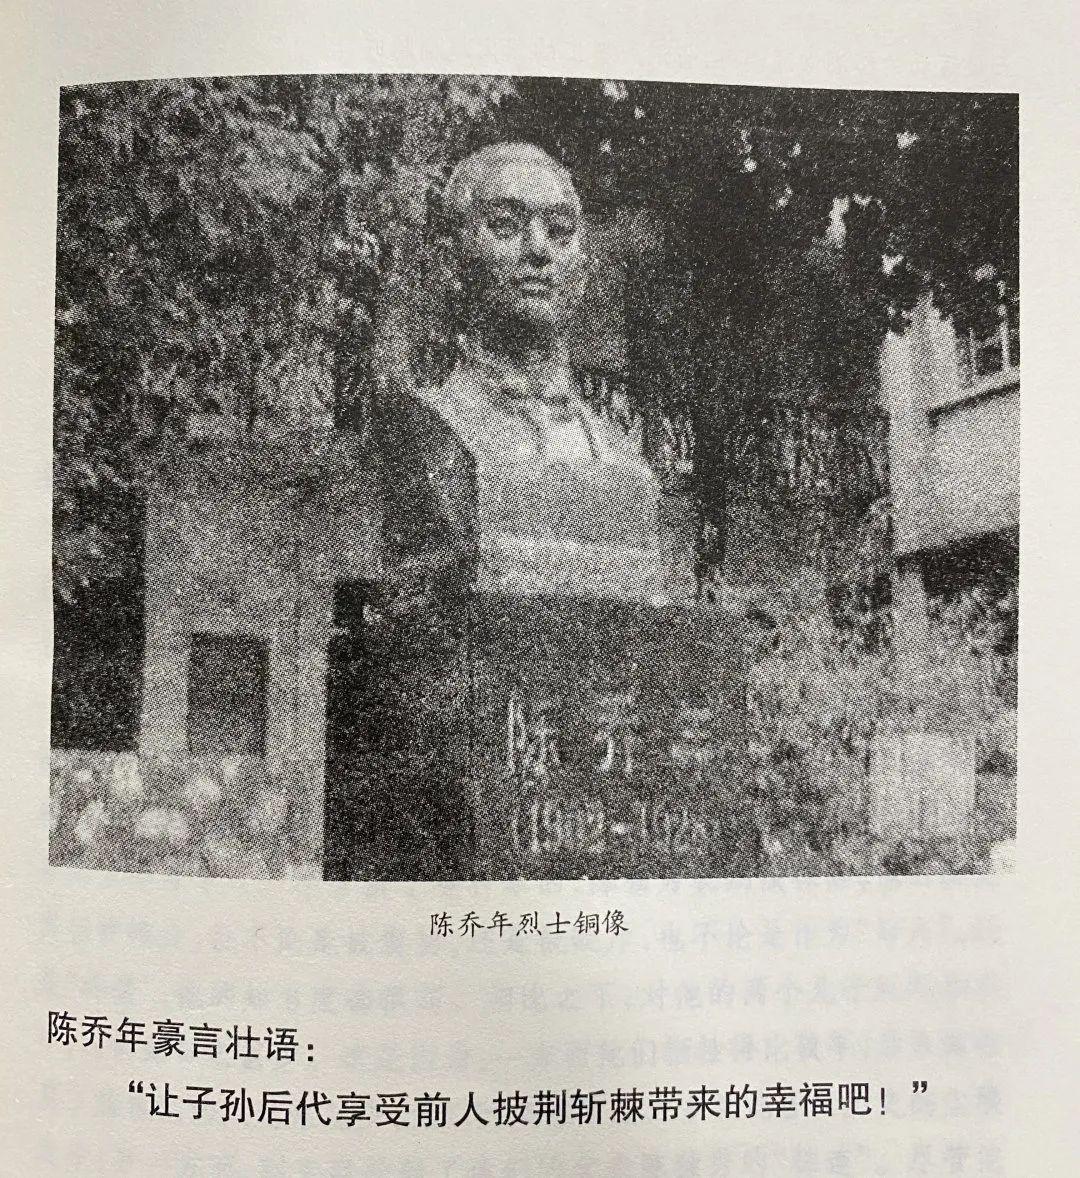 陈乔年烈士铜像